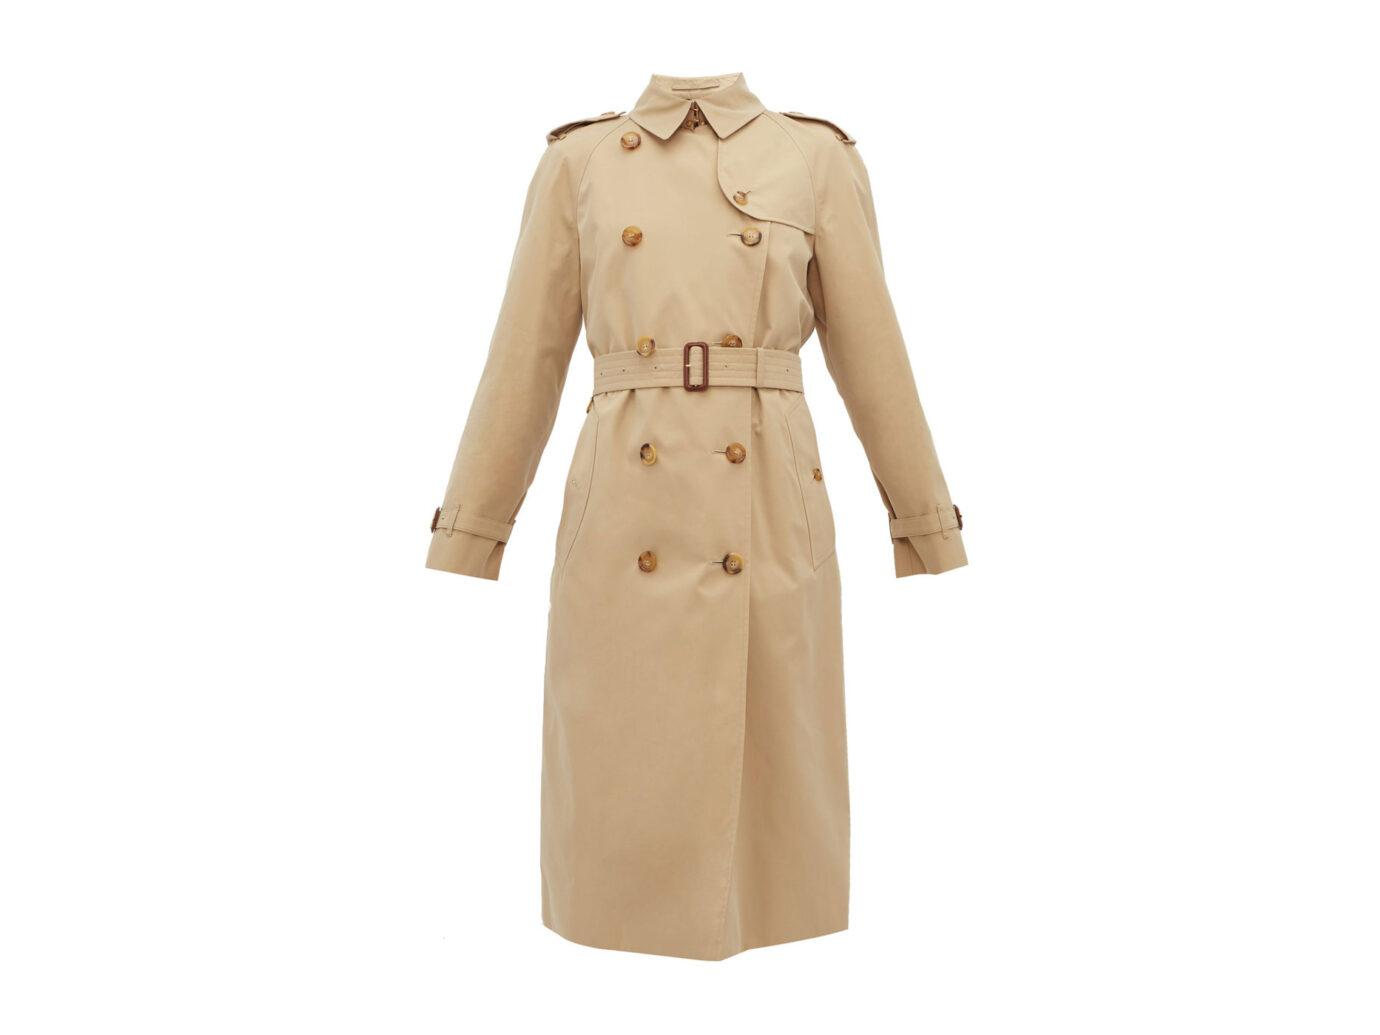 Burberry Waterloo cotton-gabardine trench coat